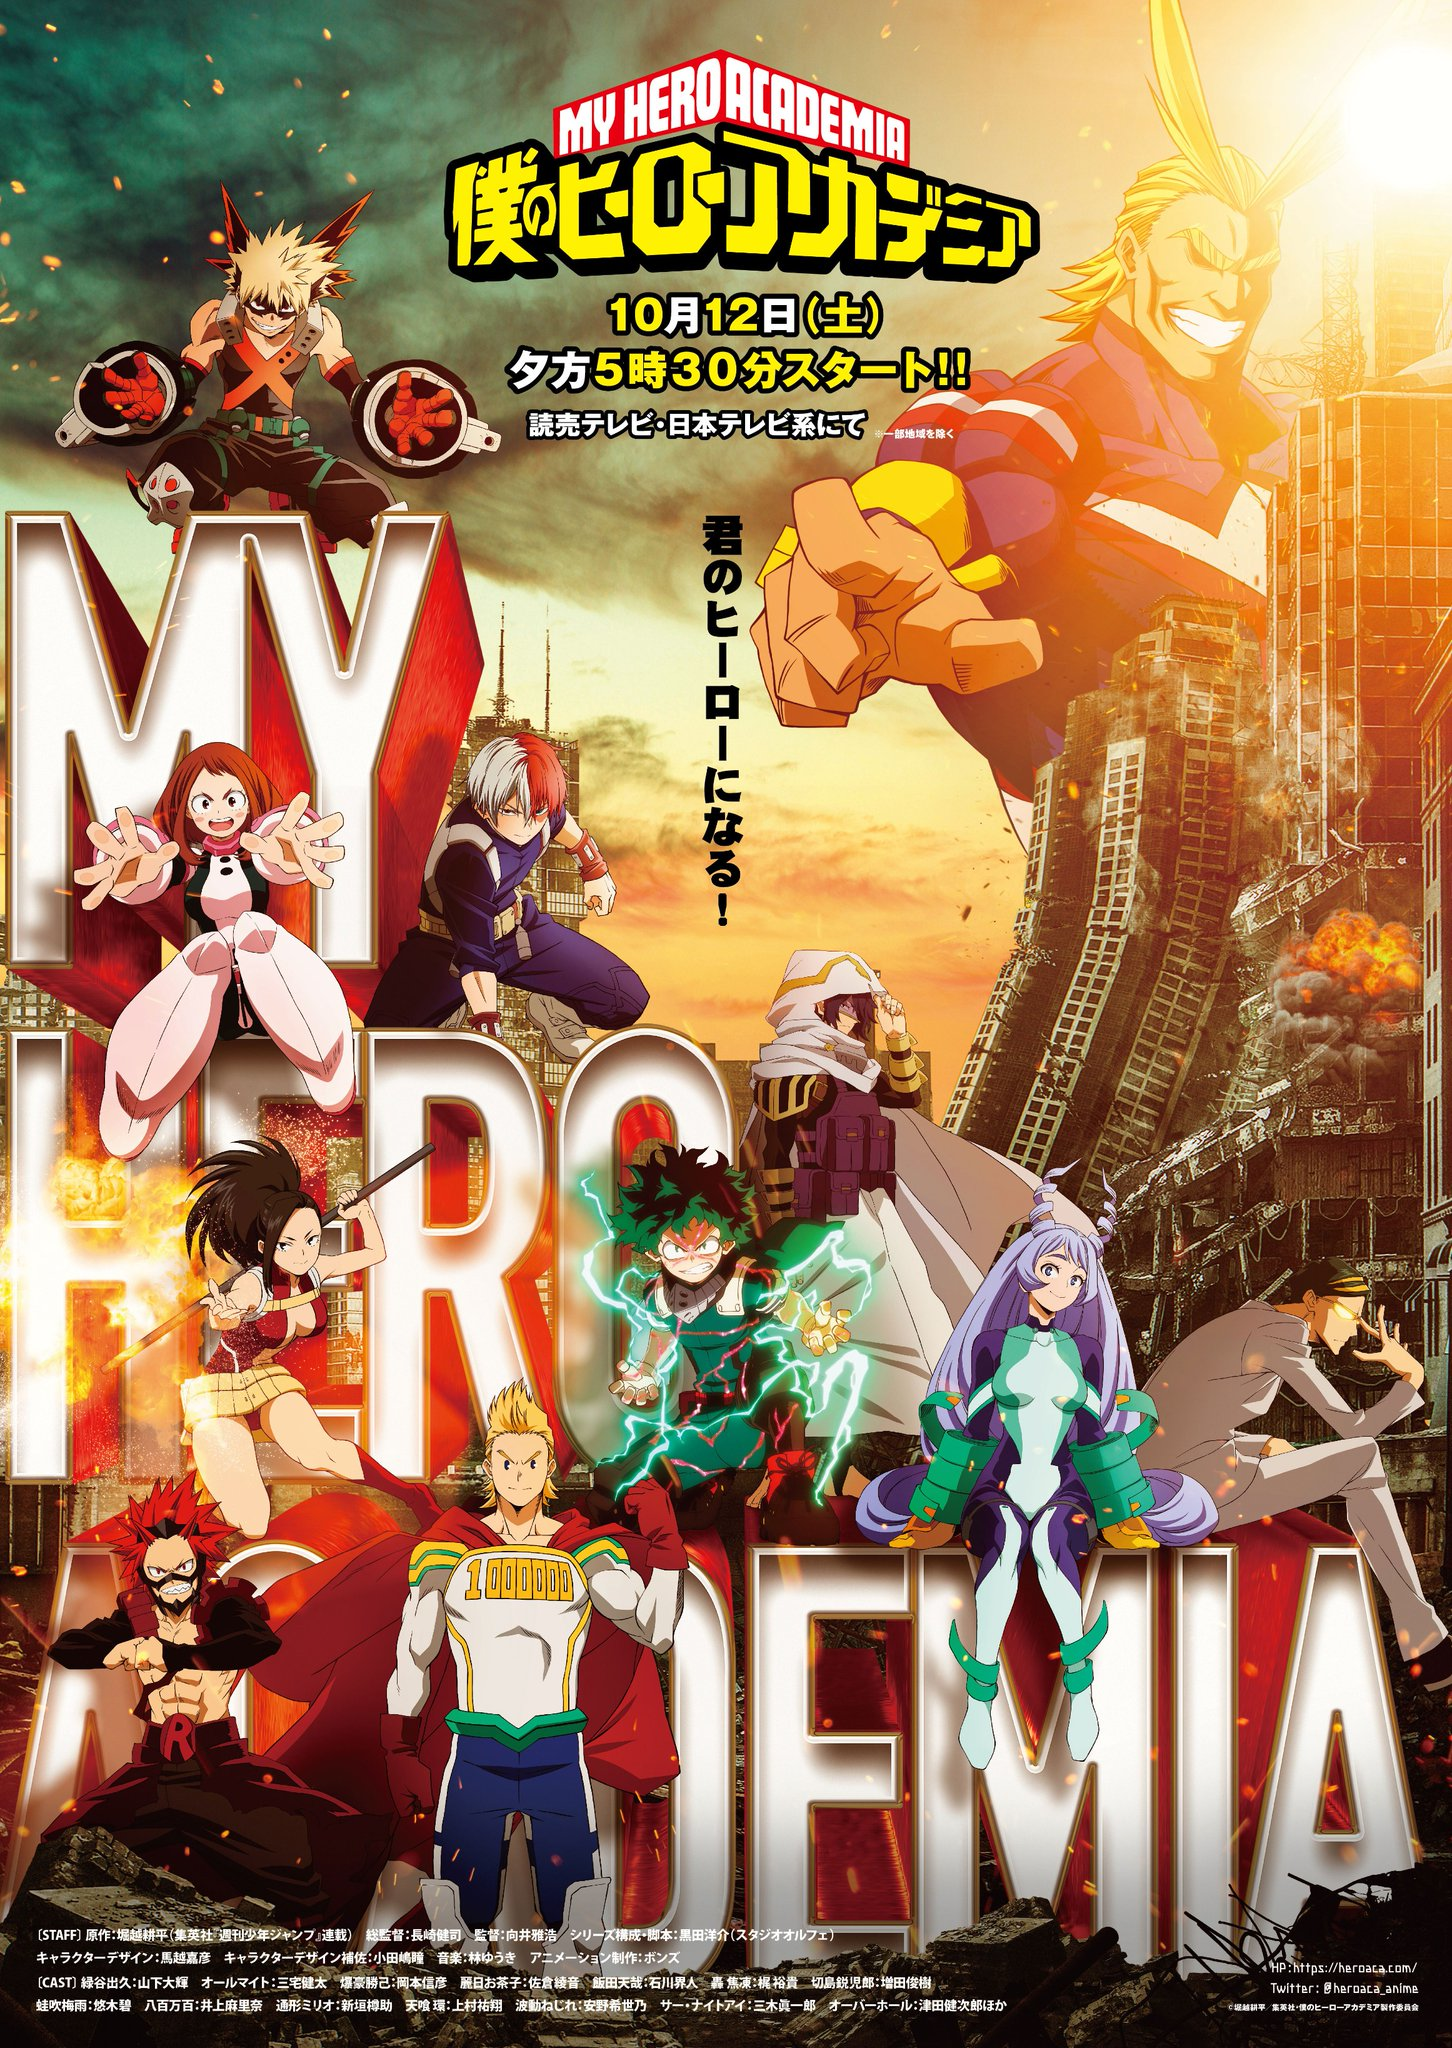 Boku no Hero Academia (My Hero Academia) มายฮีโร่ อคาเดเมีย ภาค4 พากย์ไทย